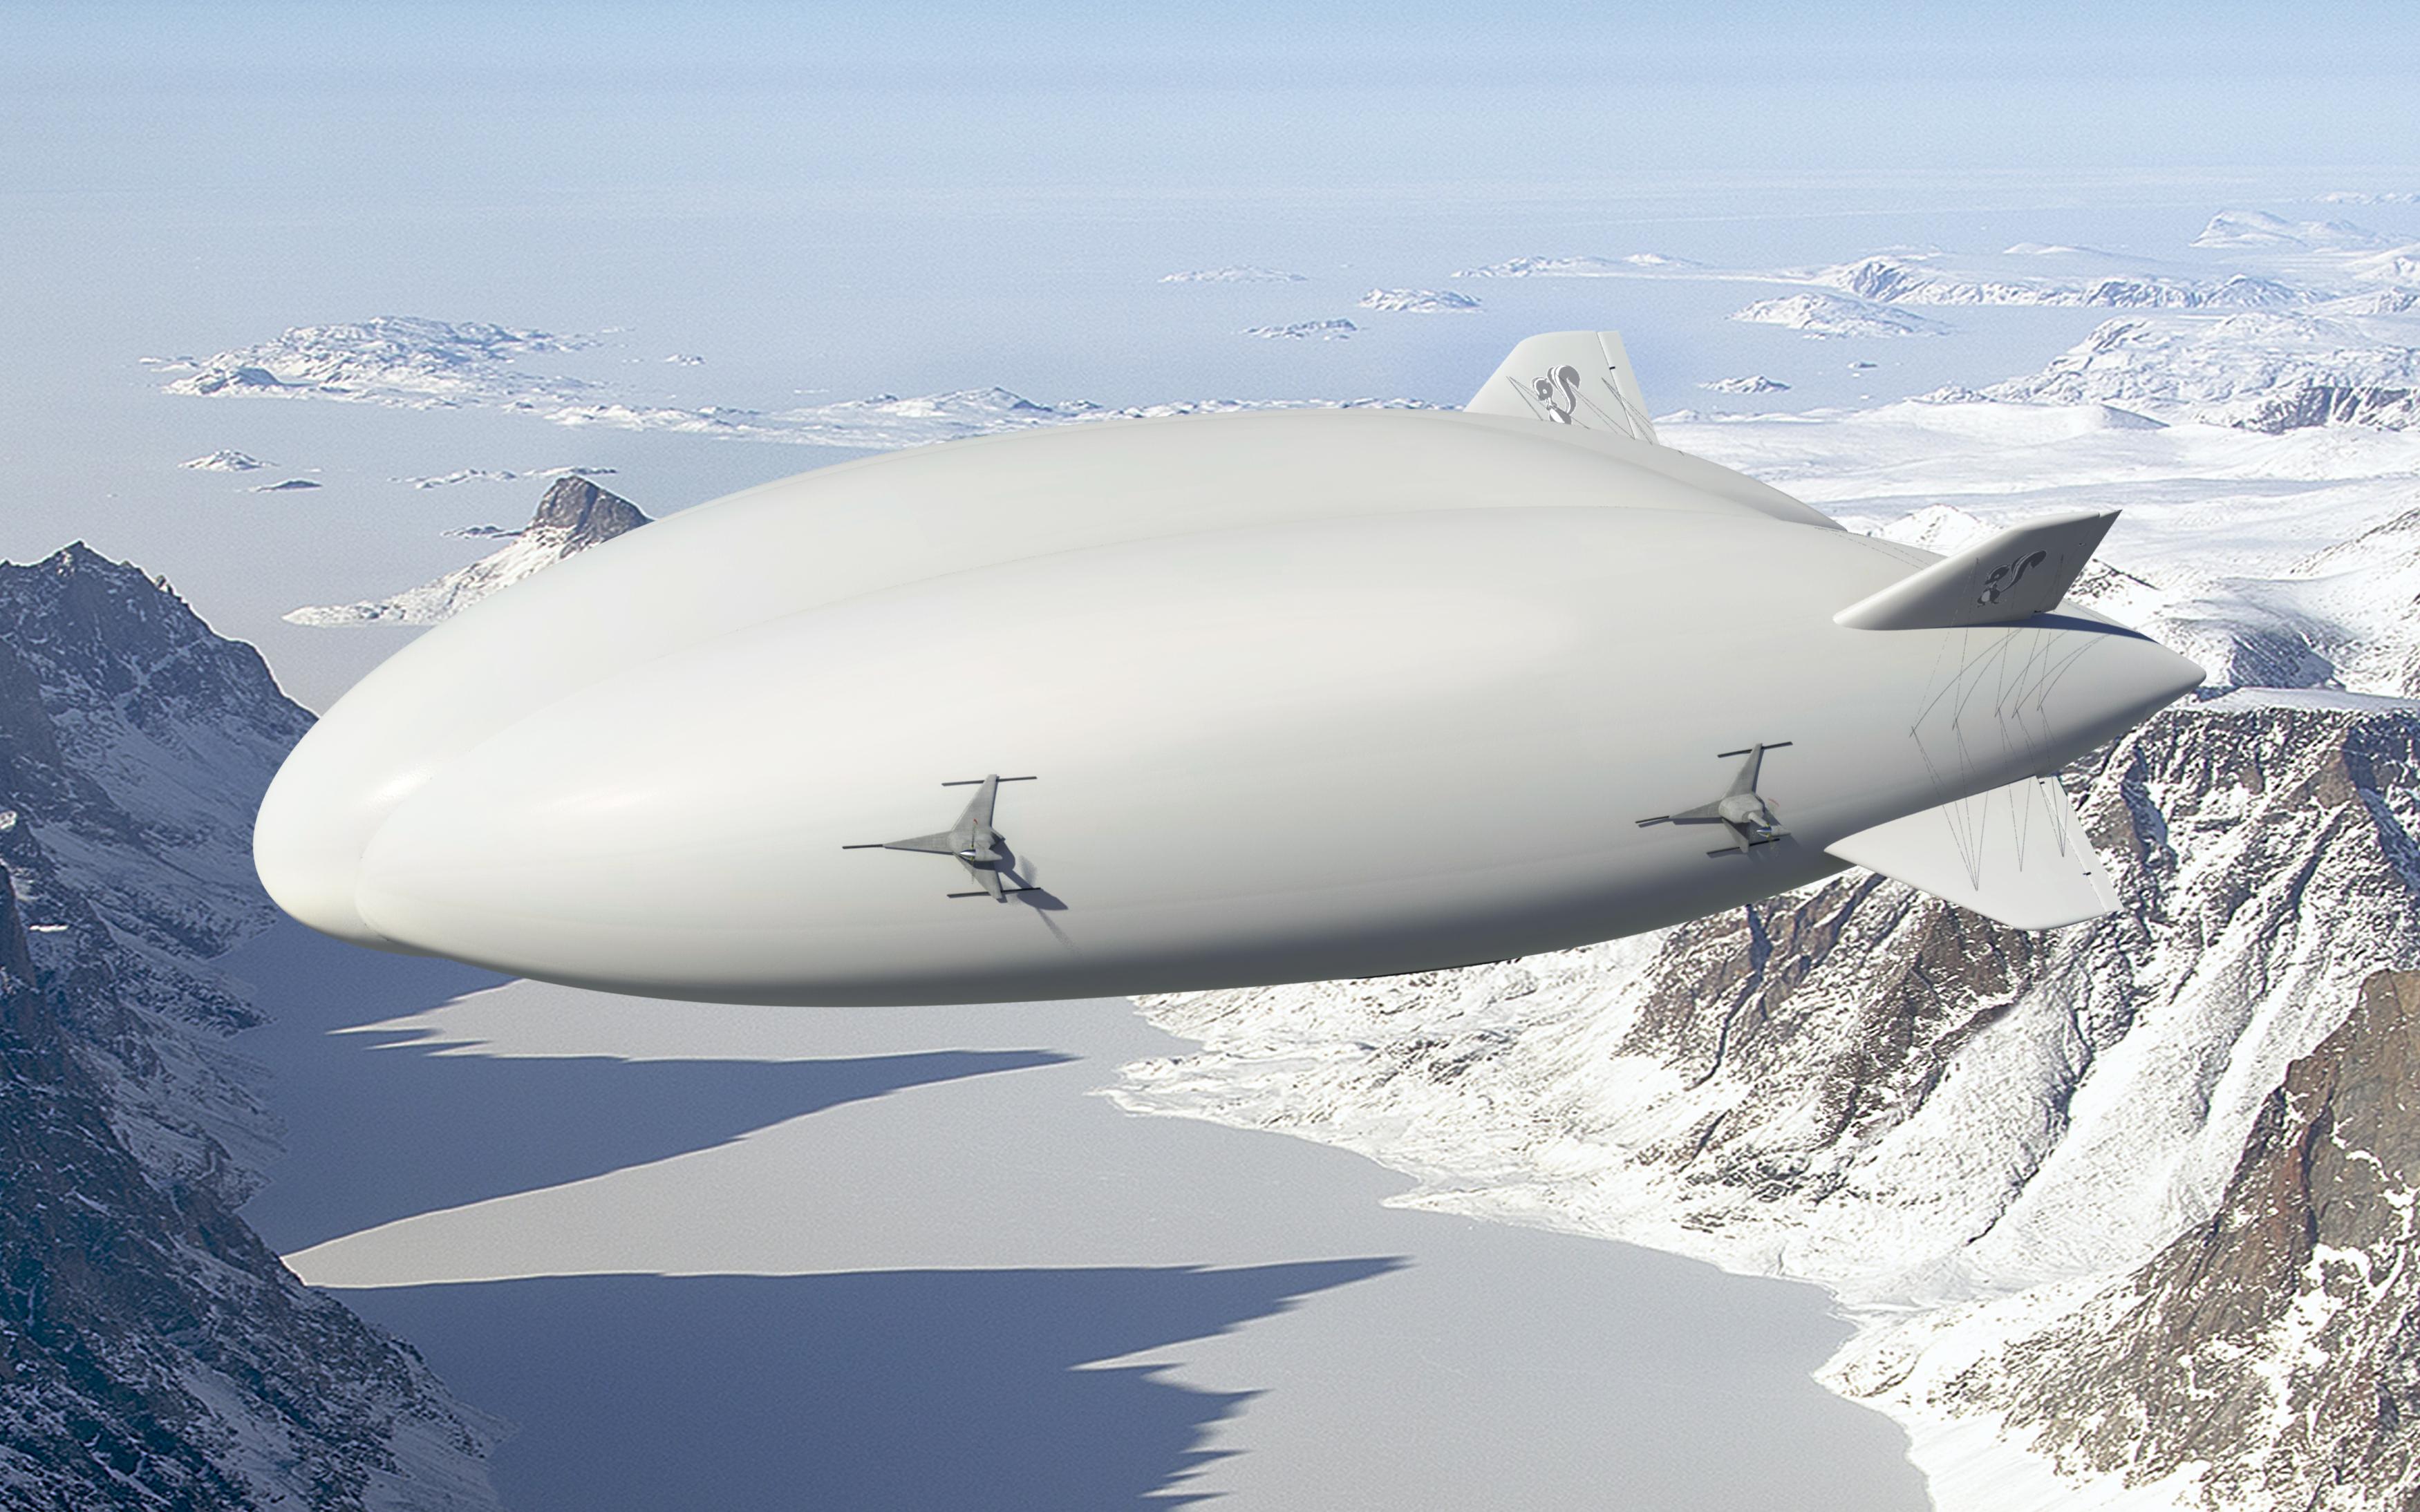 Lockheed Martin's LMH-1 Hybrid Airship will operate in Canada's North. Image: Lockheed Martin